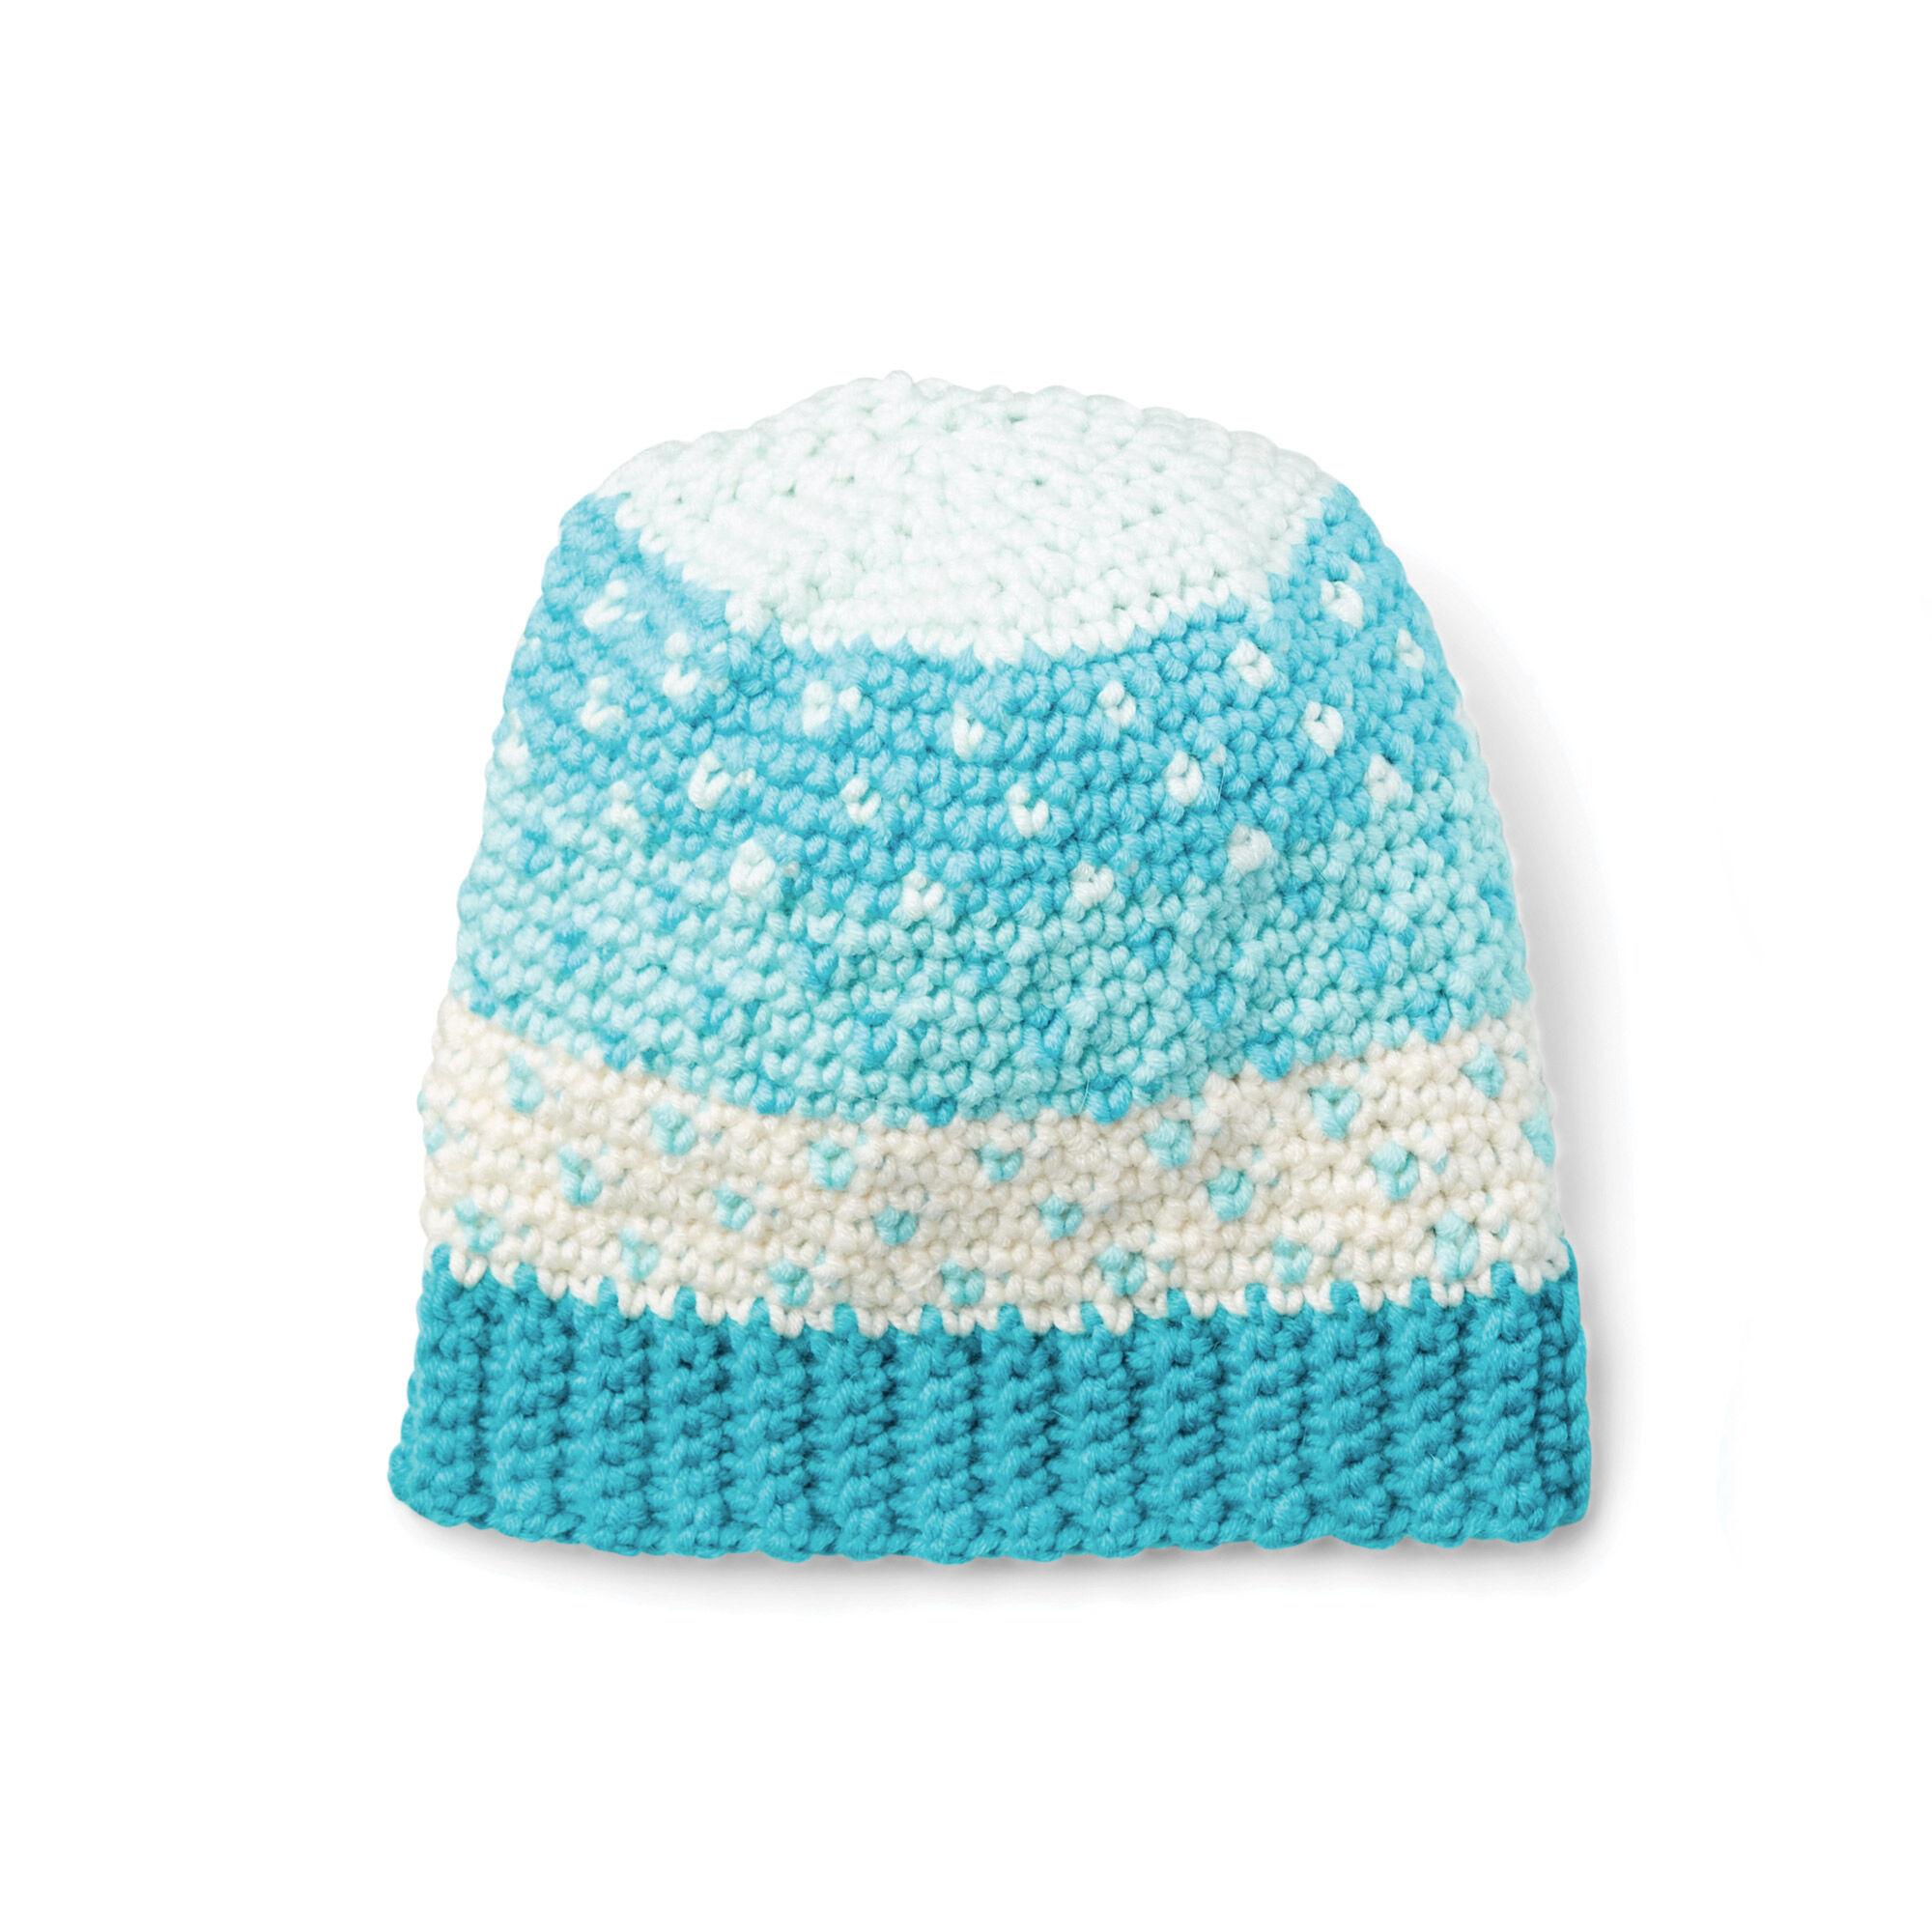 Caron x Pantone Crochet Fair Isle Hat Free Pattern  98a5d2ea82f